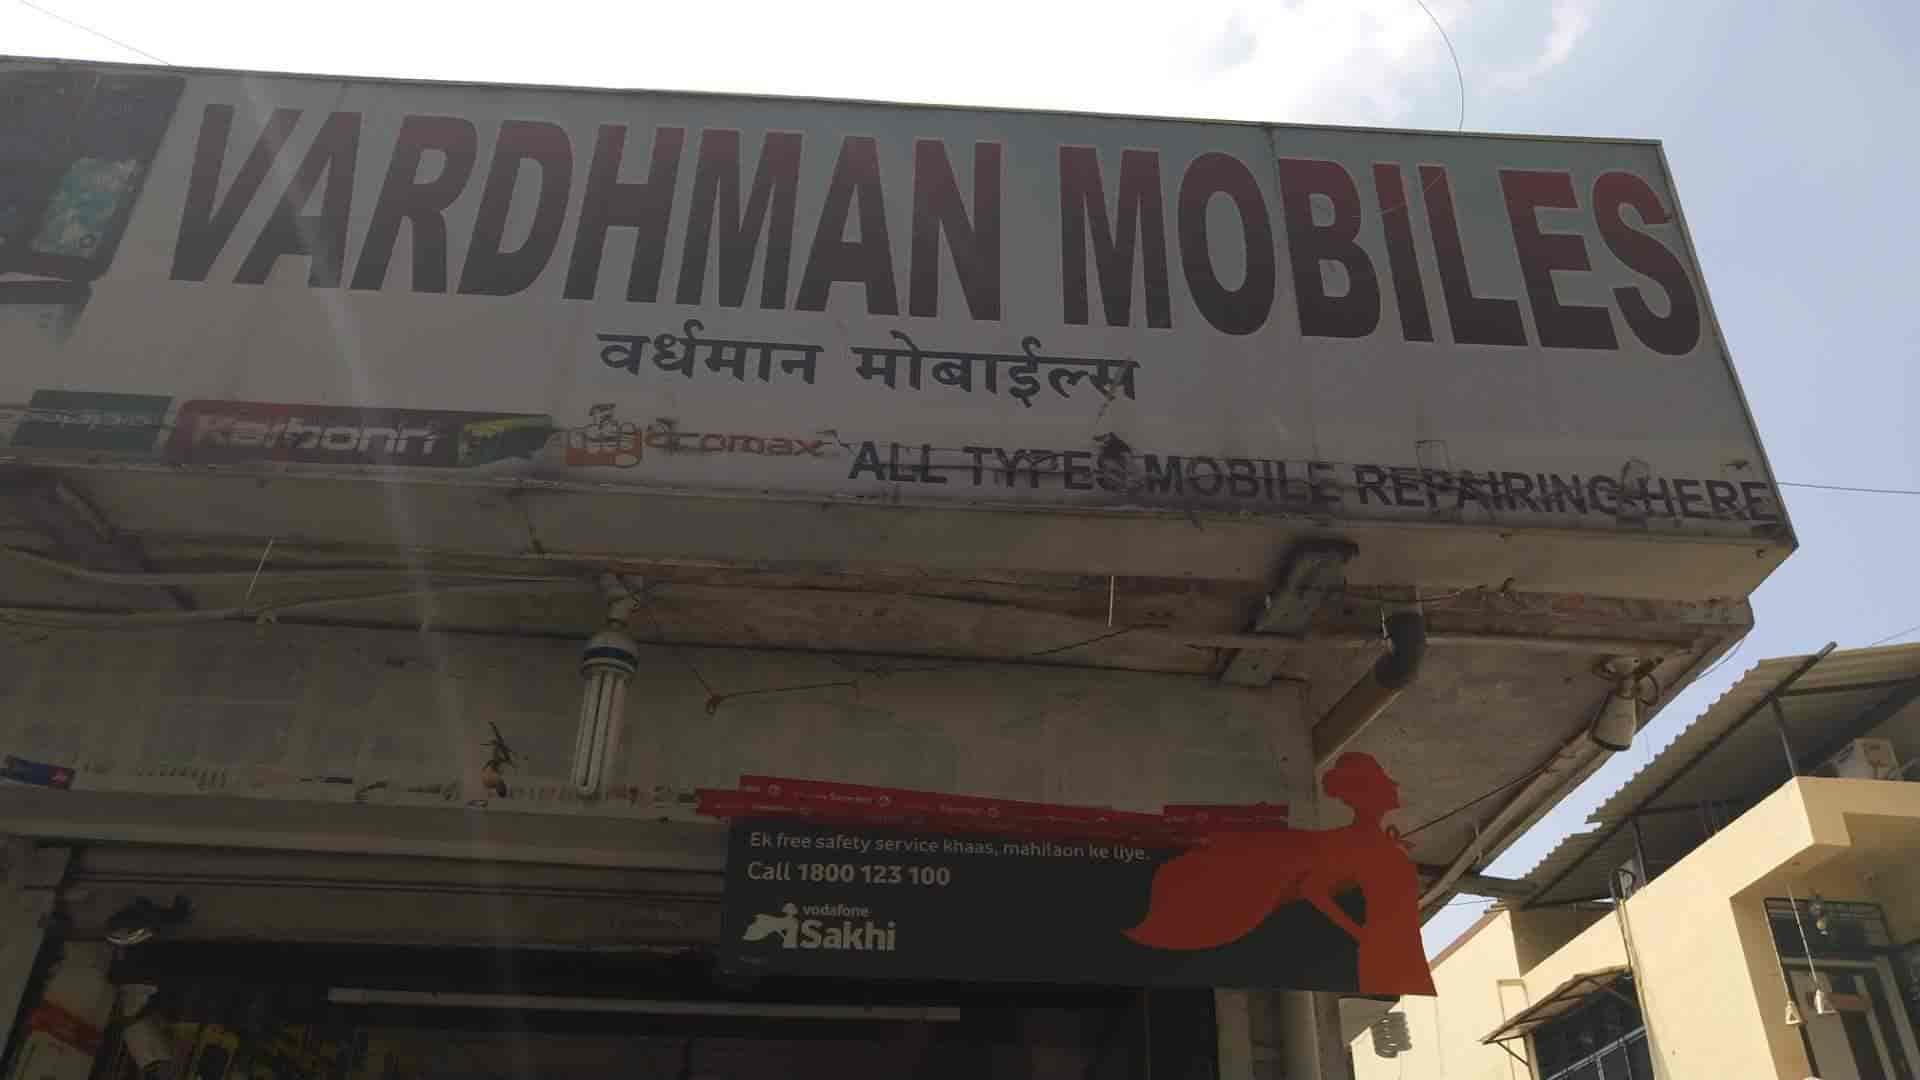 Vardhman Mobiles, Nigdi - Mobile Phone Service Providers in Pune